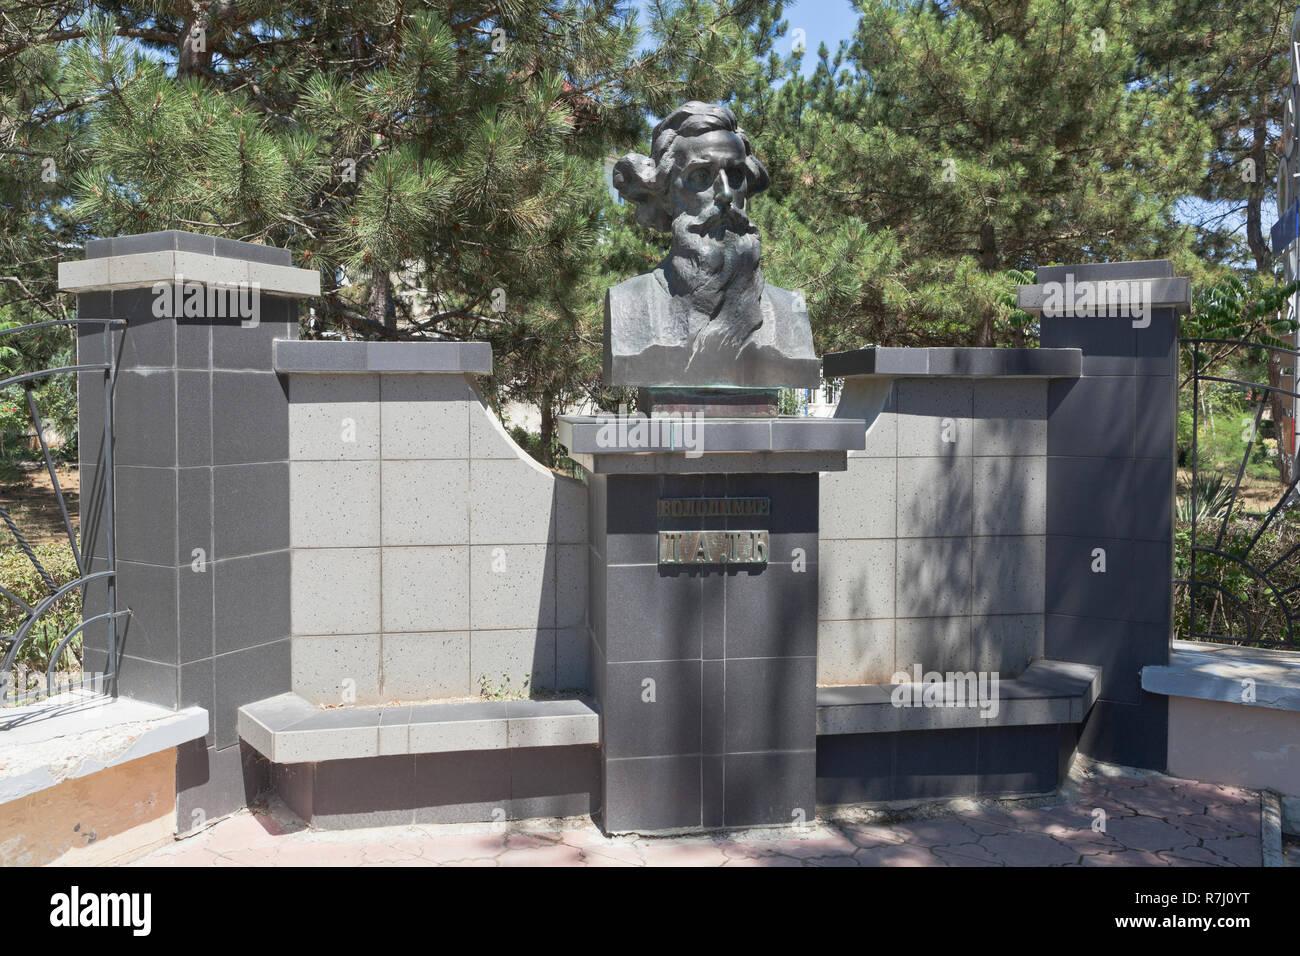 Evpatoria, Crimea, Russia - July 2, 2018: Monument to Vladimir Ivanovich Dal in the resort town of Evpatoria, Crimea - Stock Image